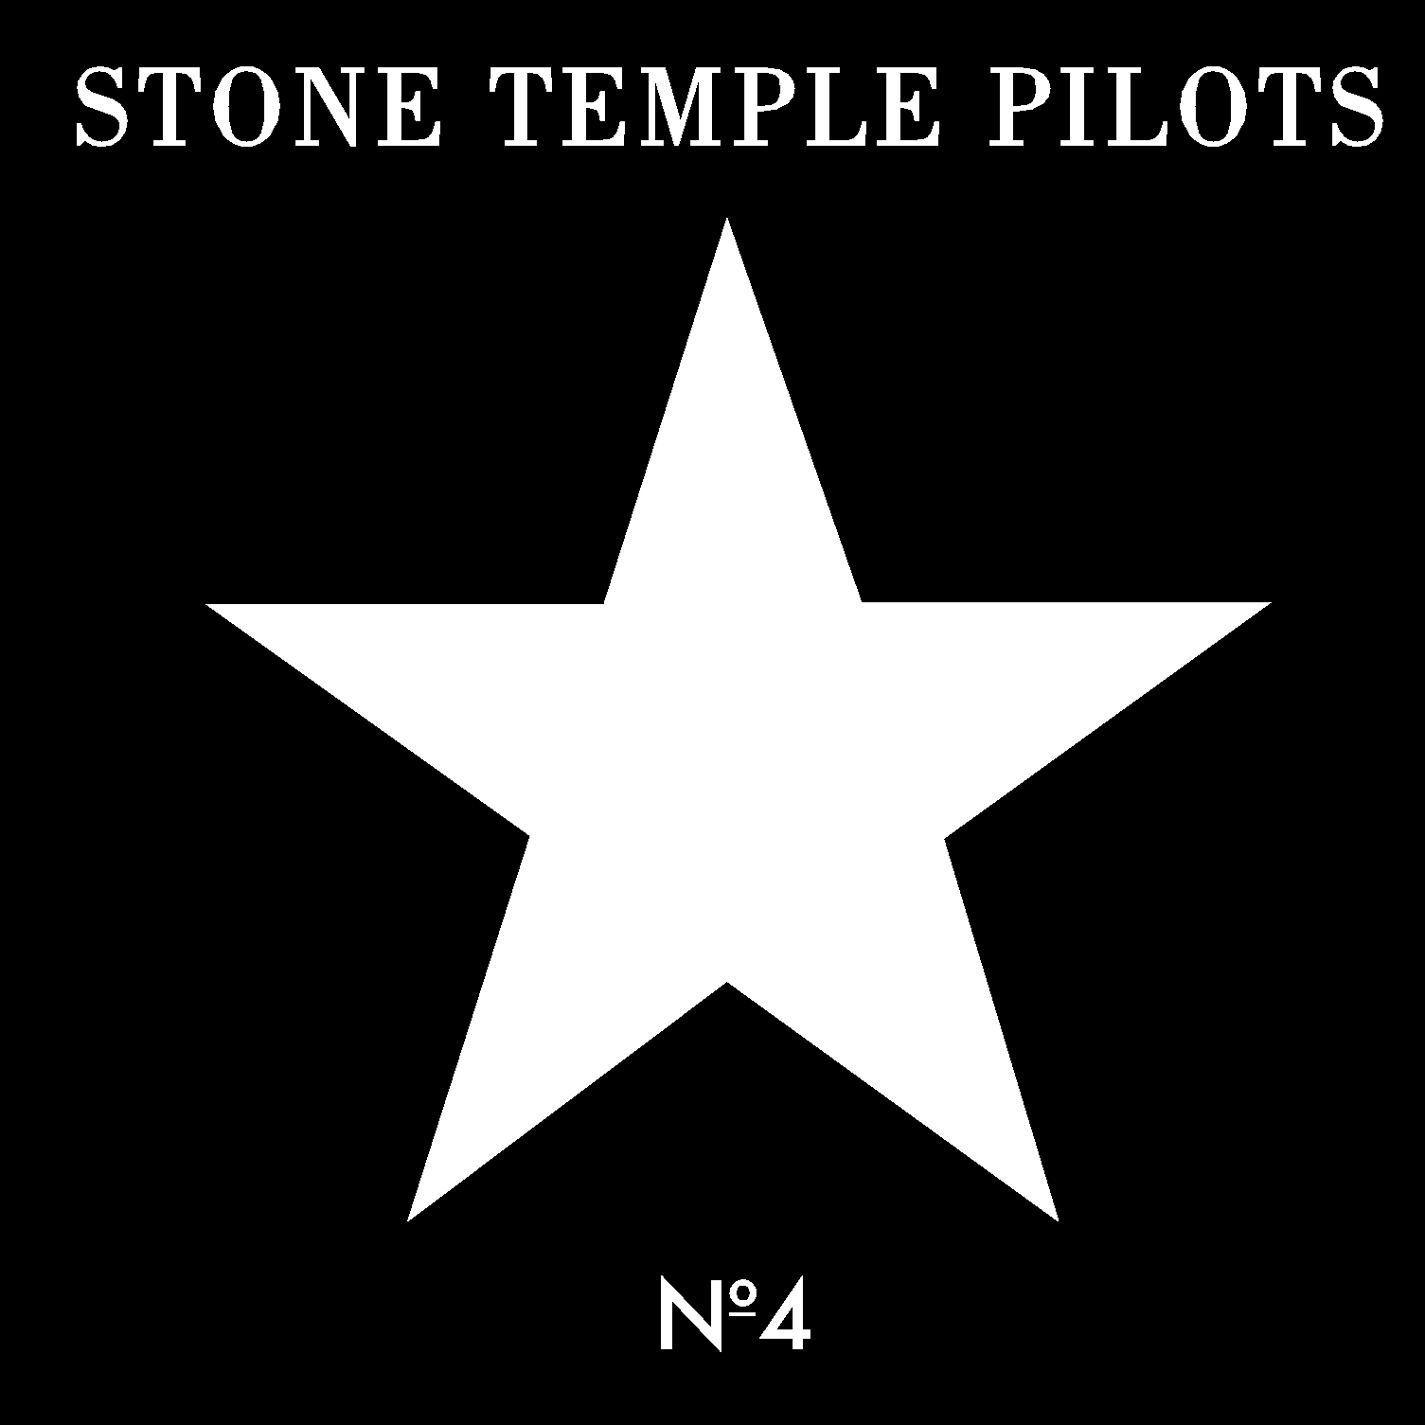 Stone Temple Pilots No 4 album cover